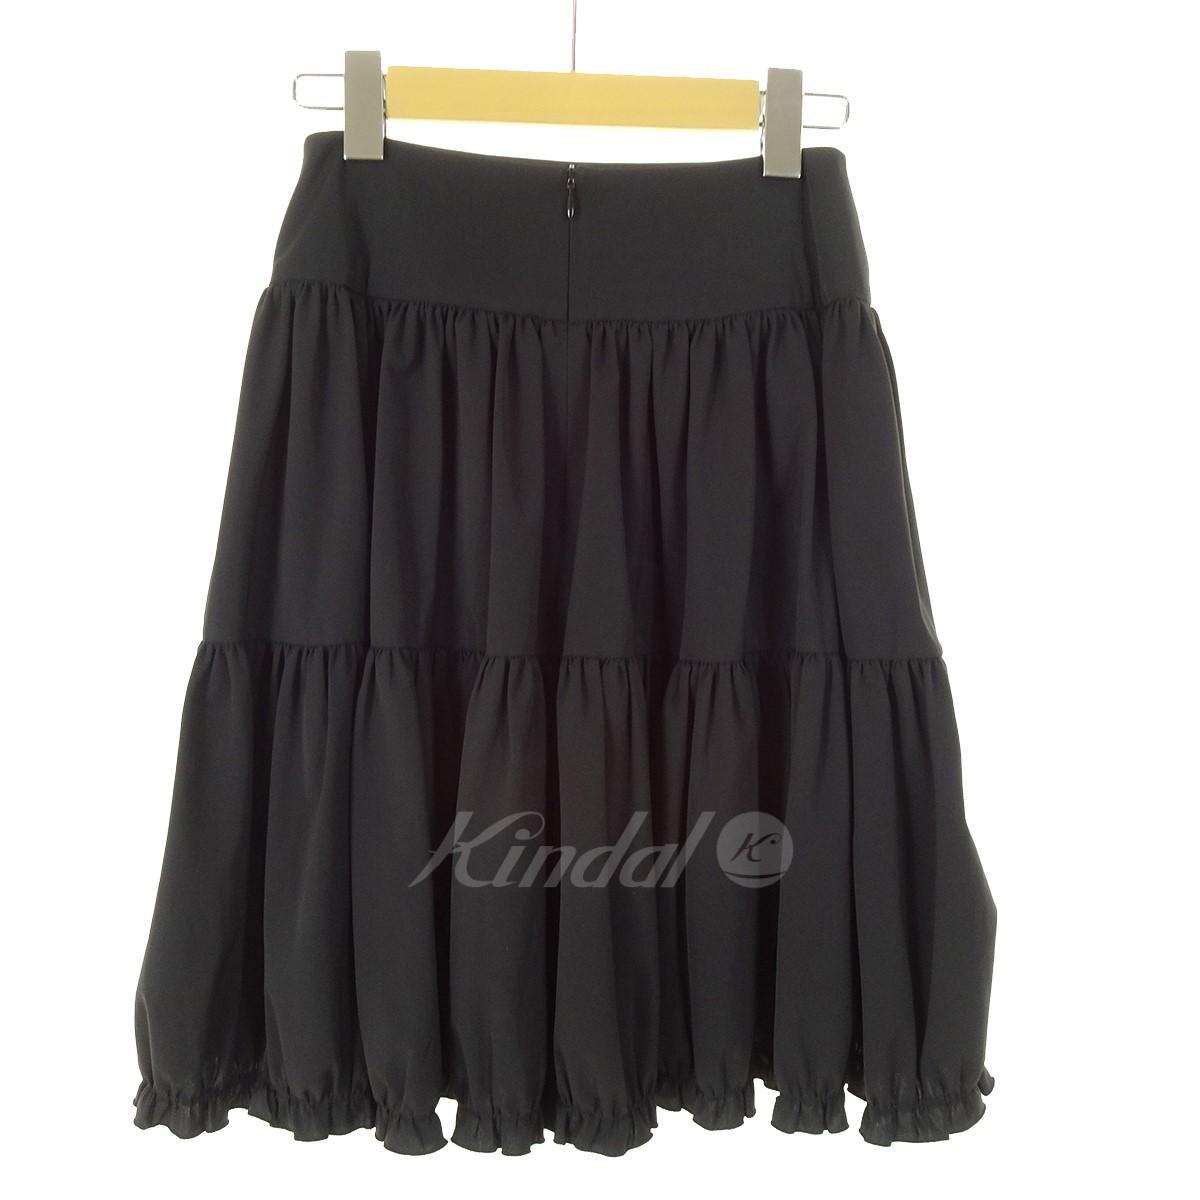 FOXEYクールストレッチスカート ブラック サイズ 38 10月31日見直しIYD2WEH9